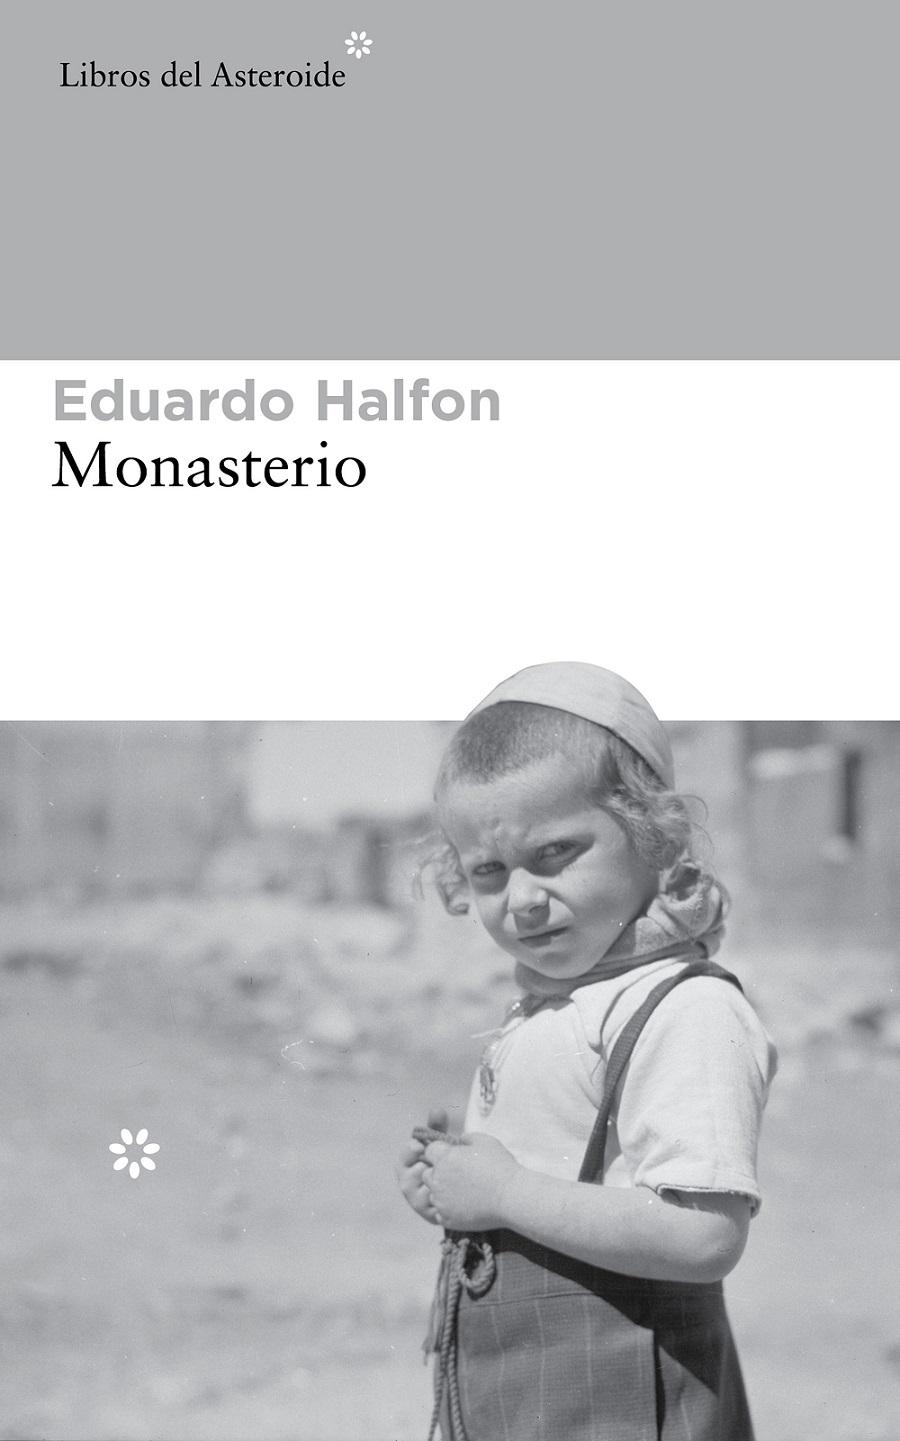 http://laantiguabiblos.blogspot.com.es/2016/09/monasterio-eduardo-halfon.html